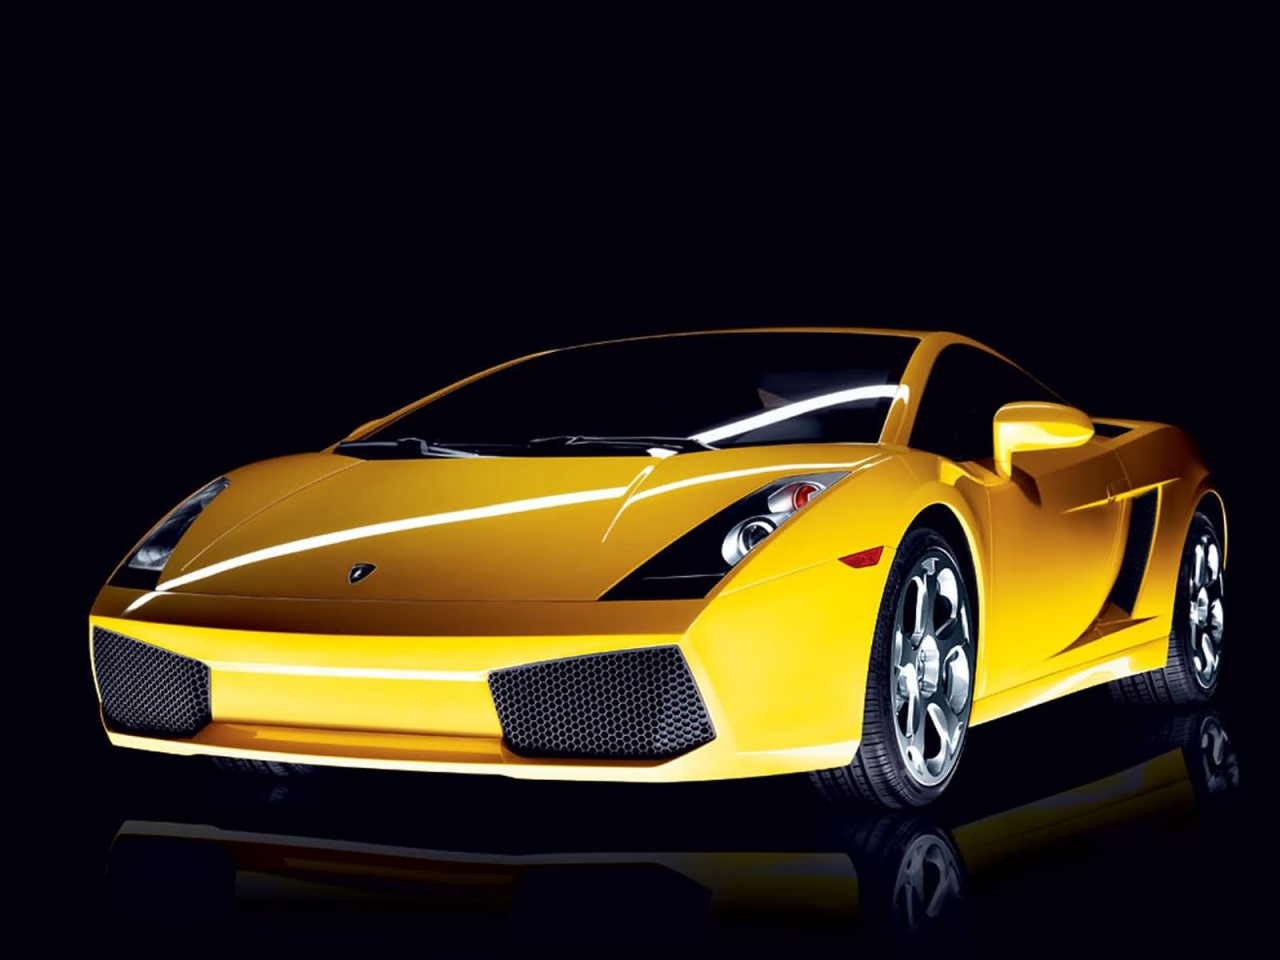 Lamborghini Cars Pictures Cool Car Hd Wallpaper HD Wallpaper Car - Cool lamborghini cars